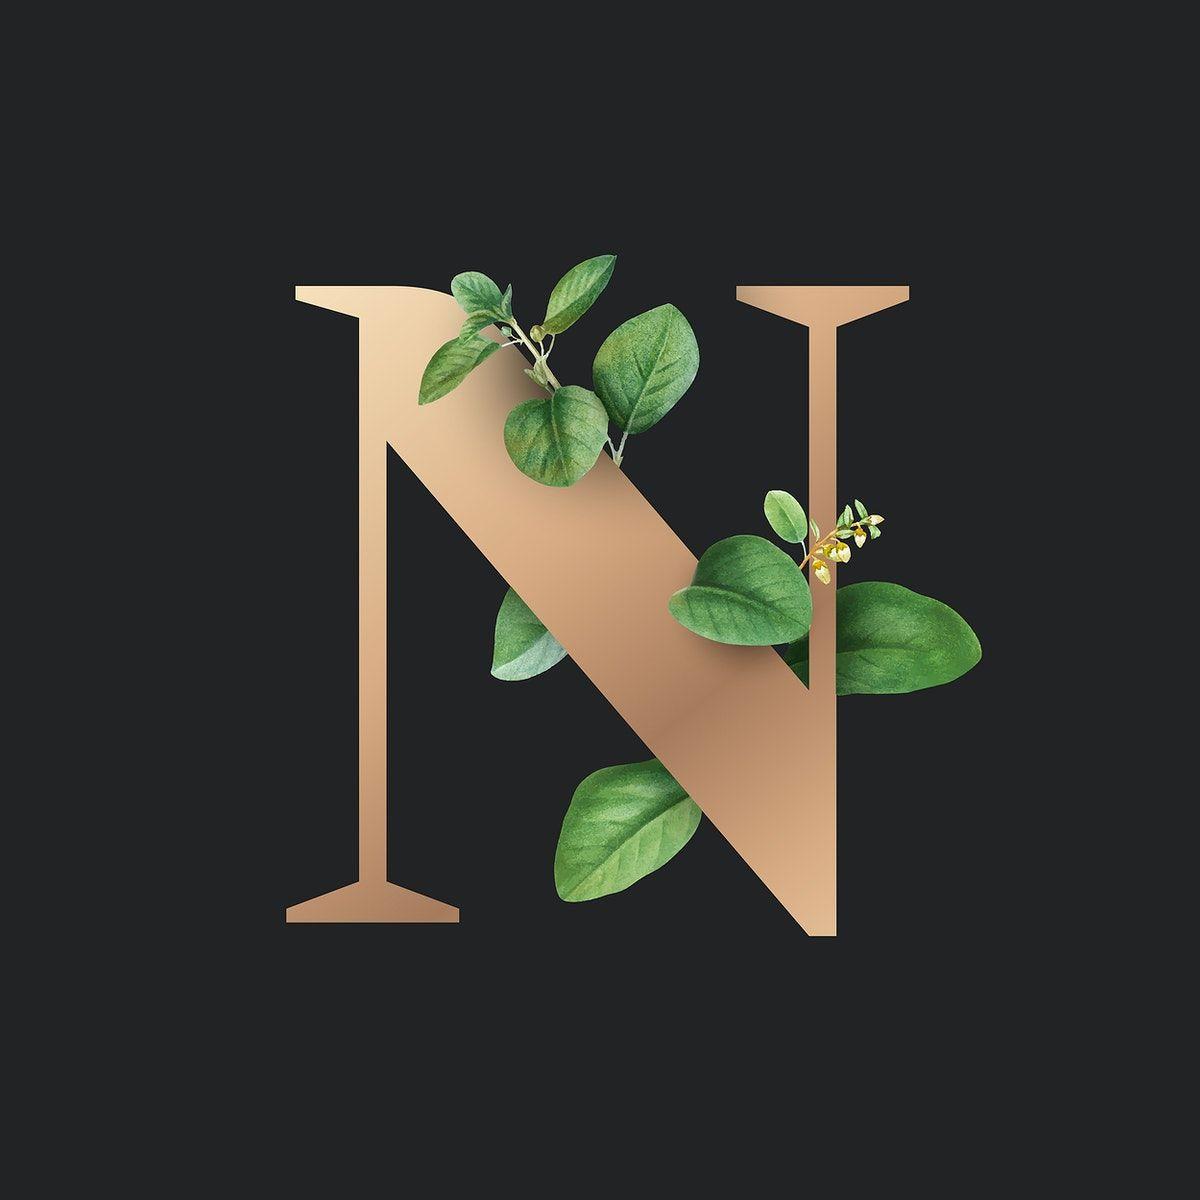 Download Premium Vector Of Botanical Capital Letter N Vector 584857 Harfleme Balonlar Logo Tasarimi